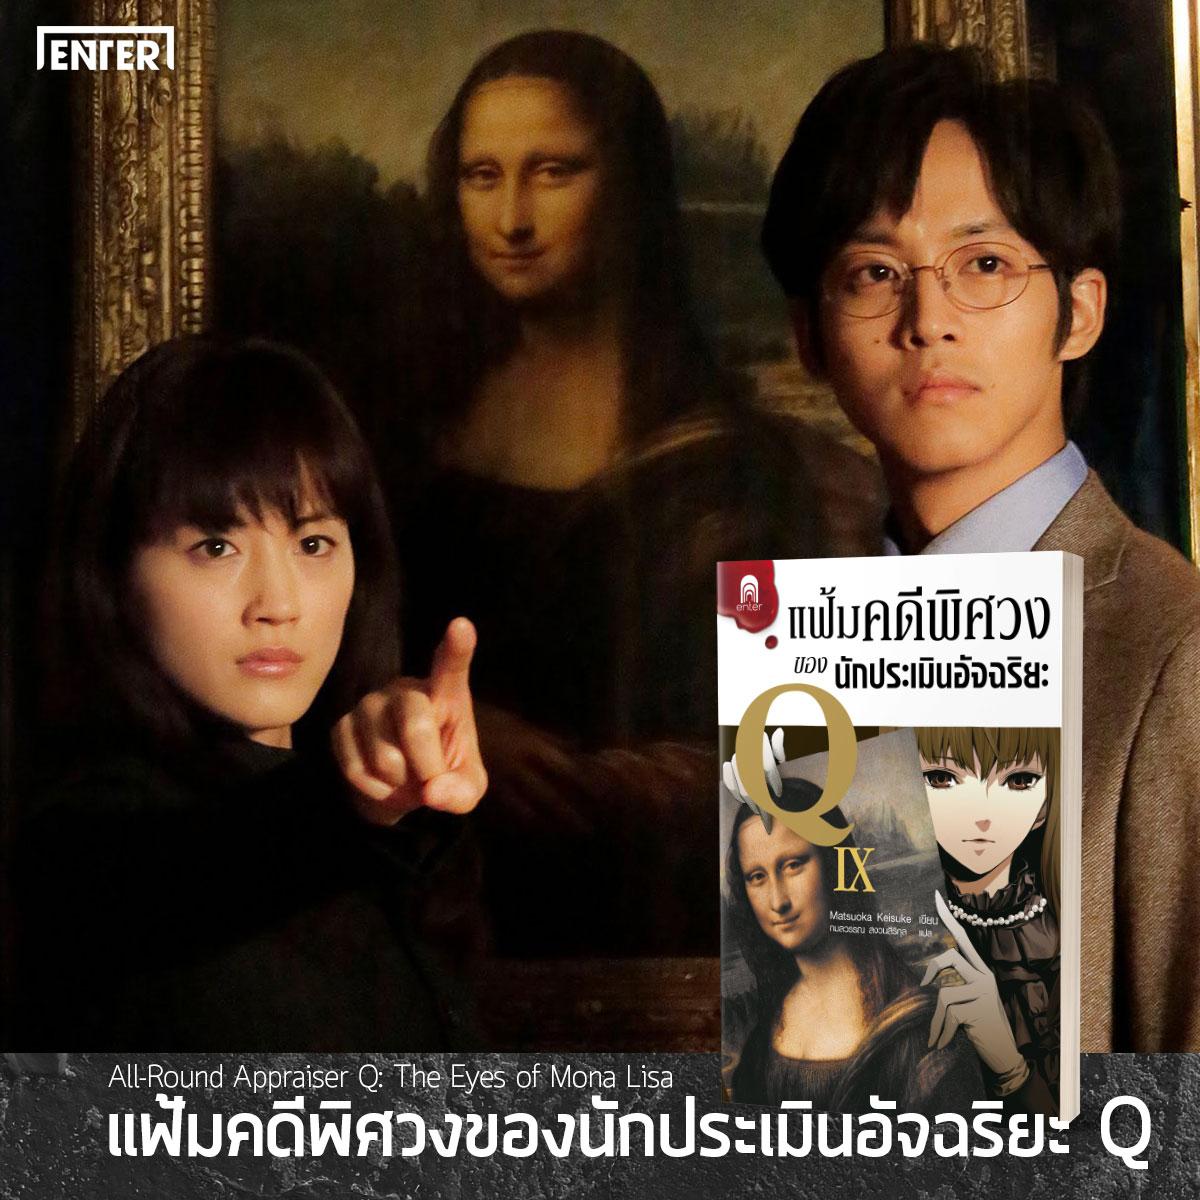 Enter_Movies_Q9